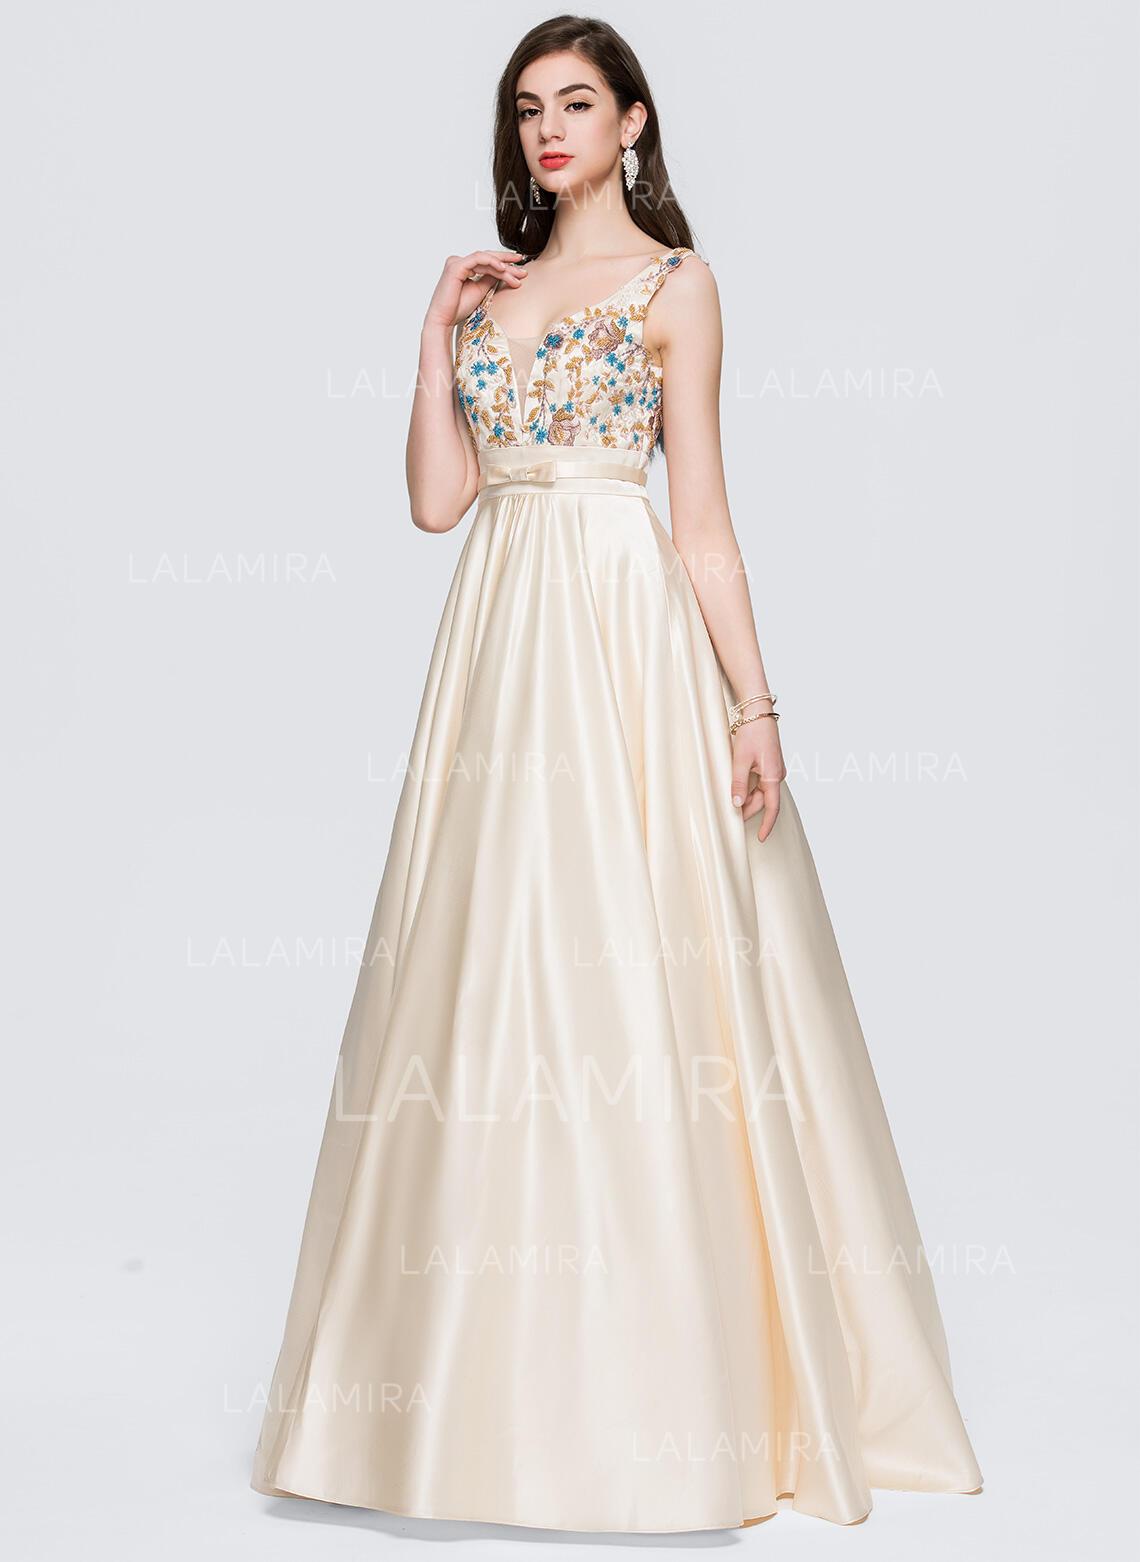 Flare Evening Dresses